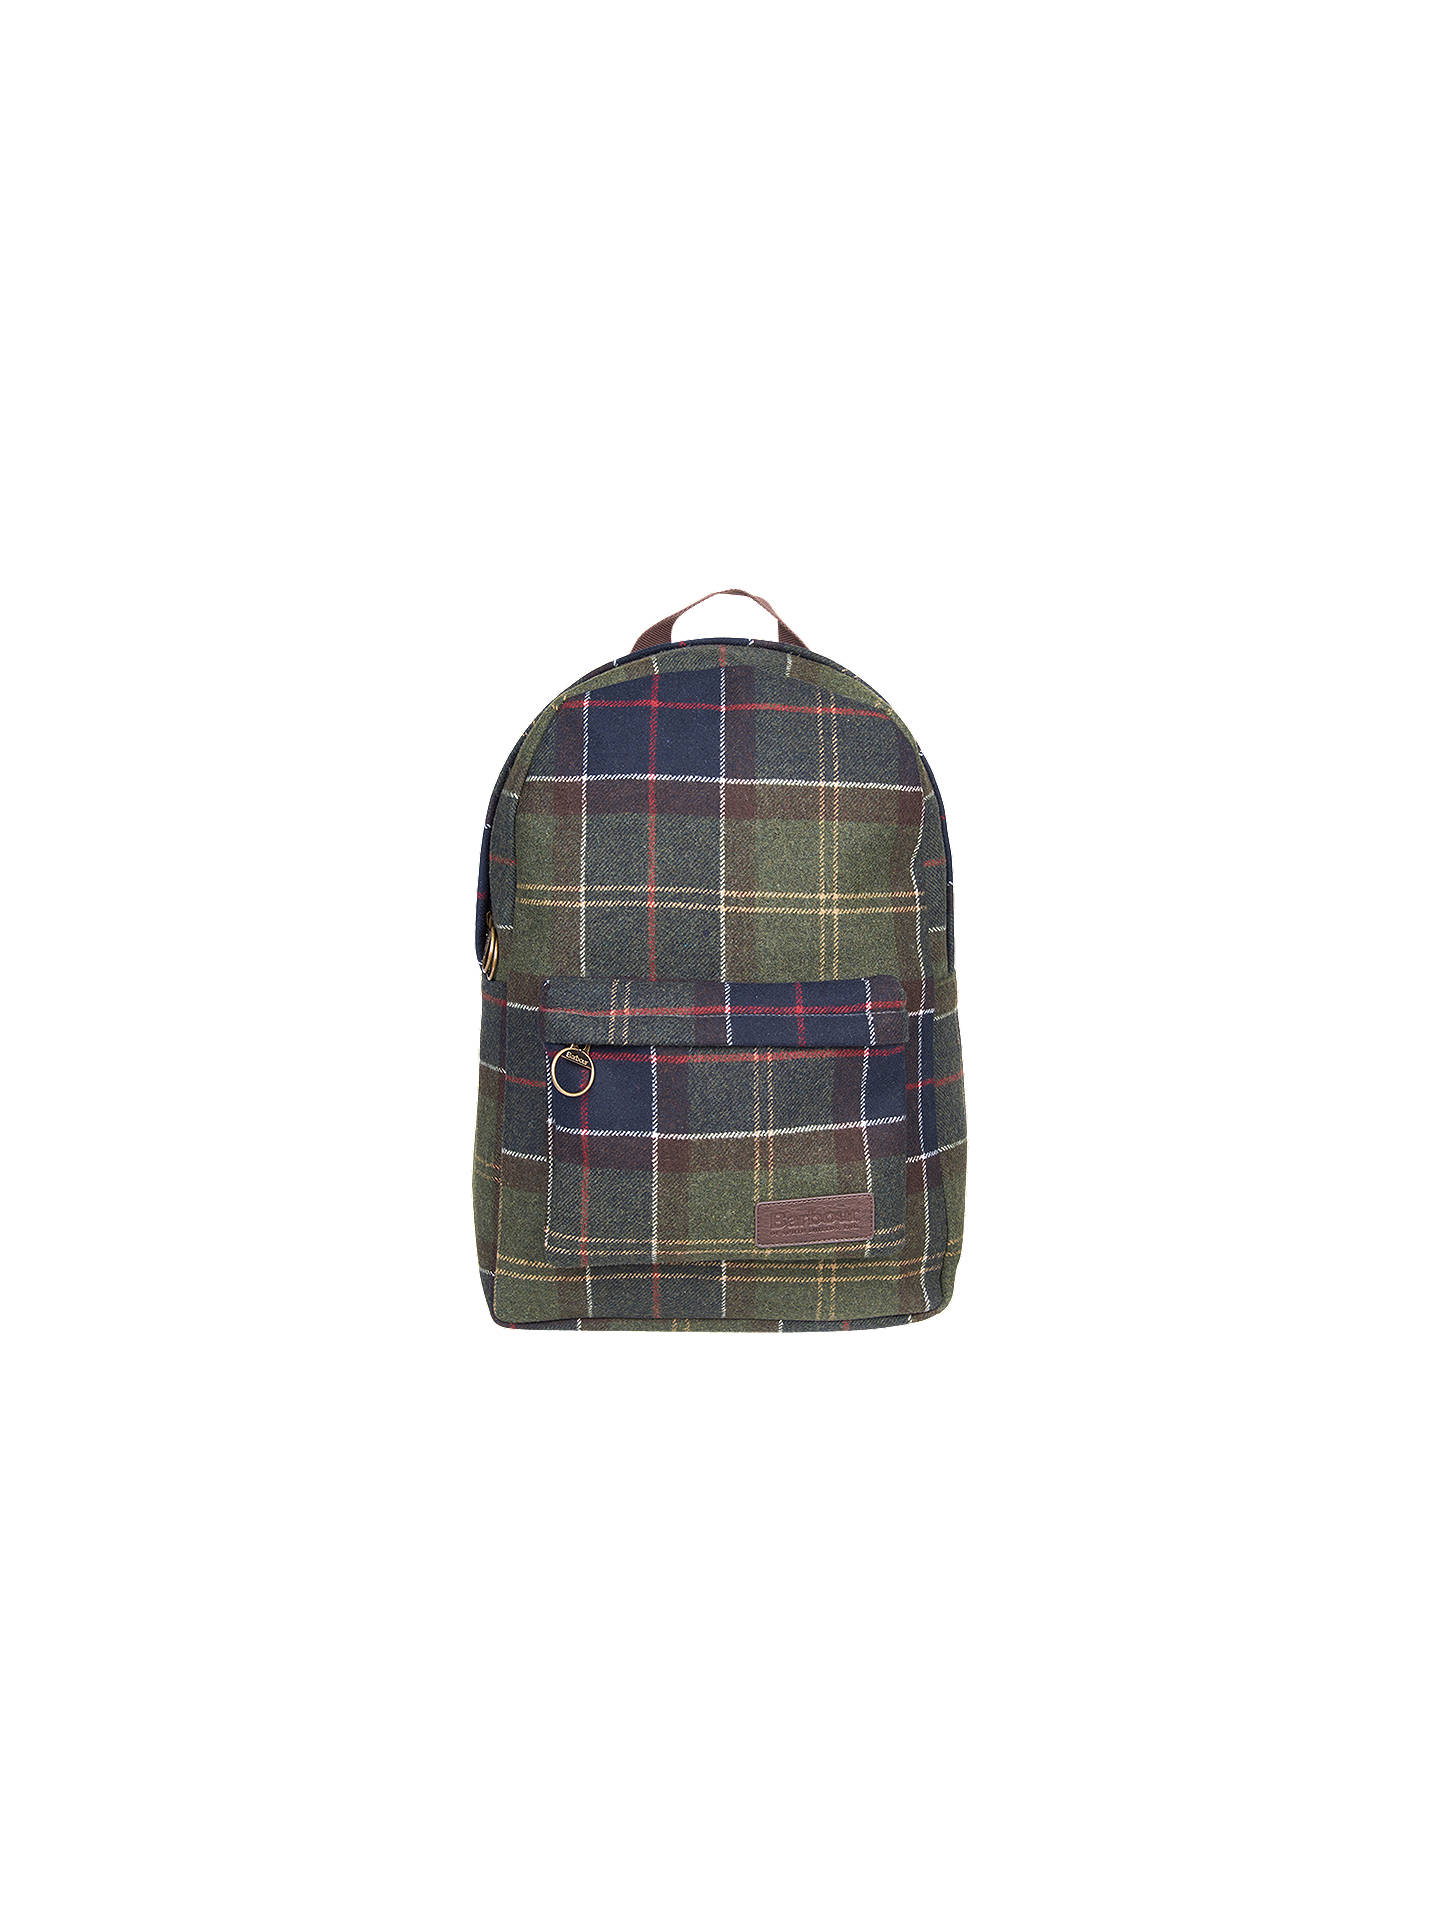 21b38ebe0f Buy Barbour Carrbridge Backpack